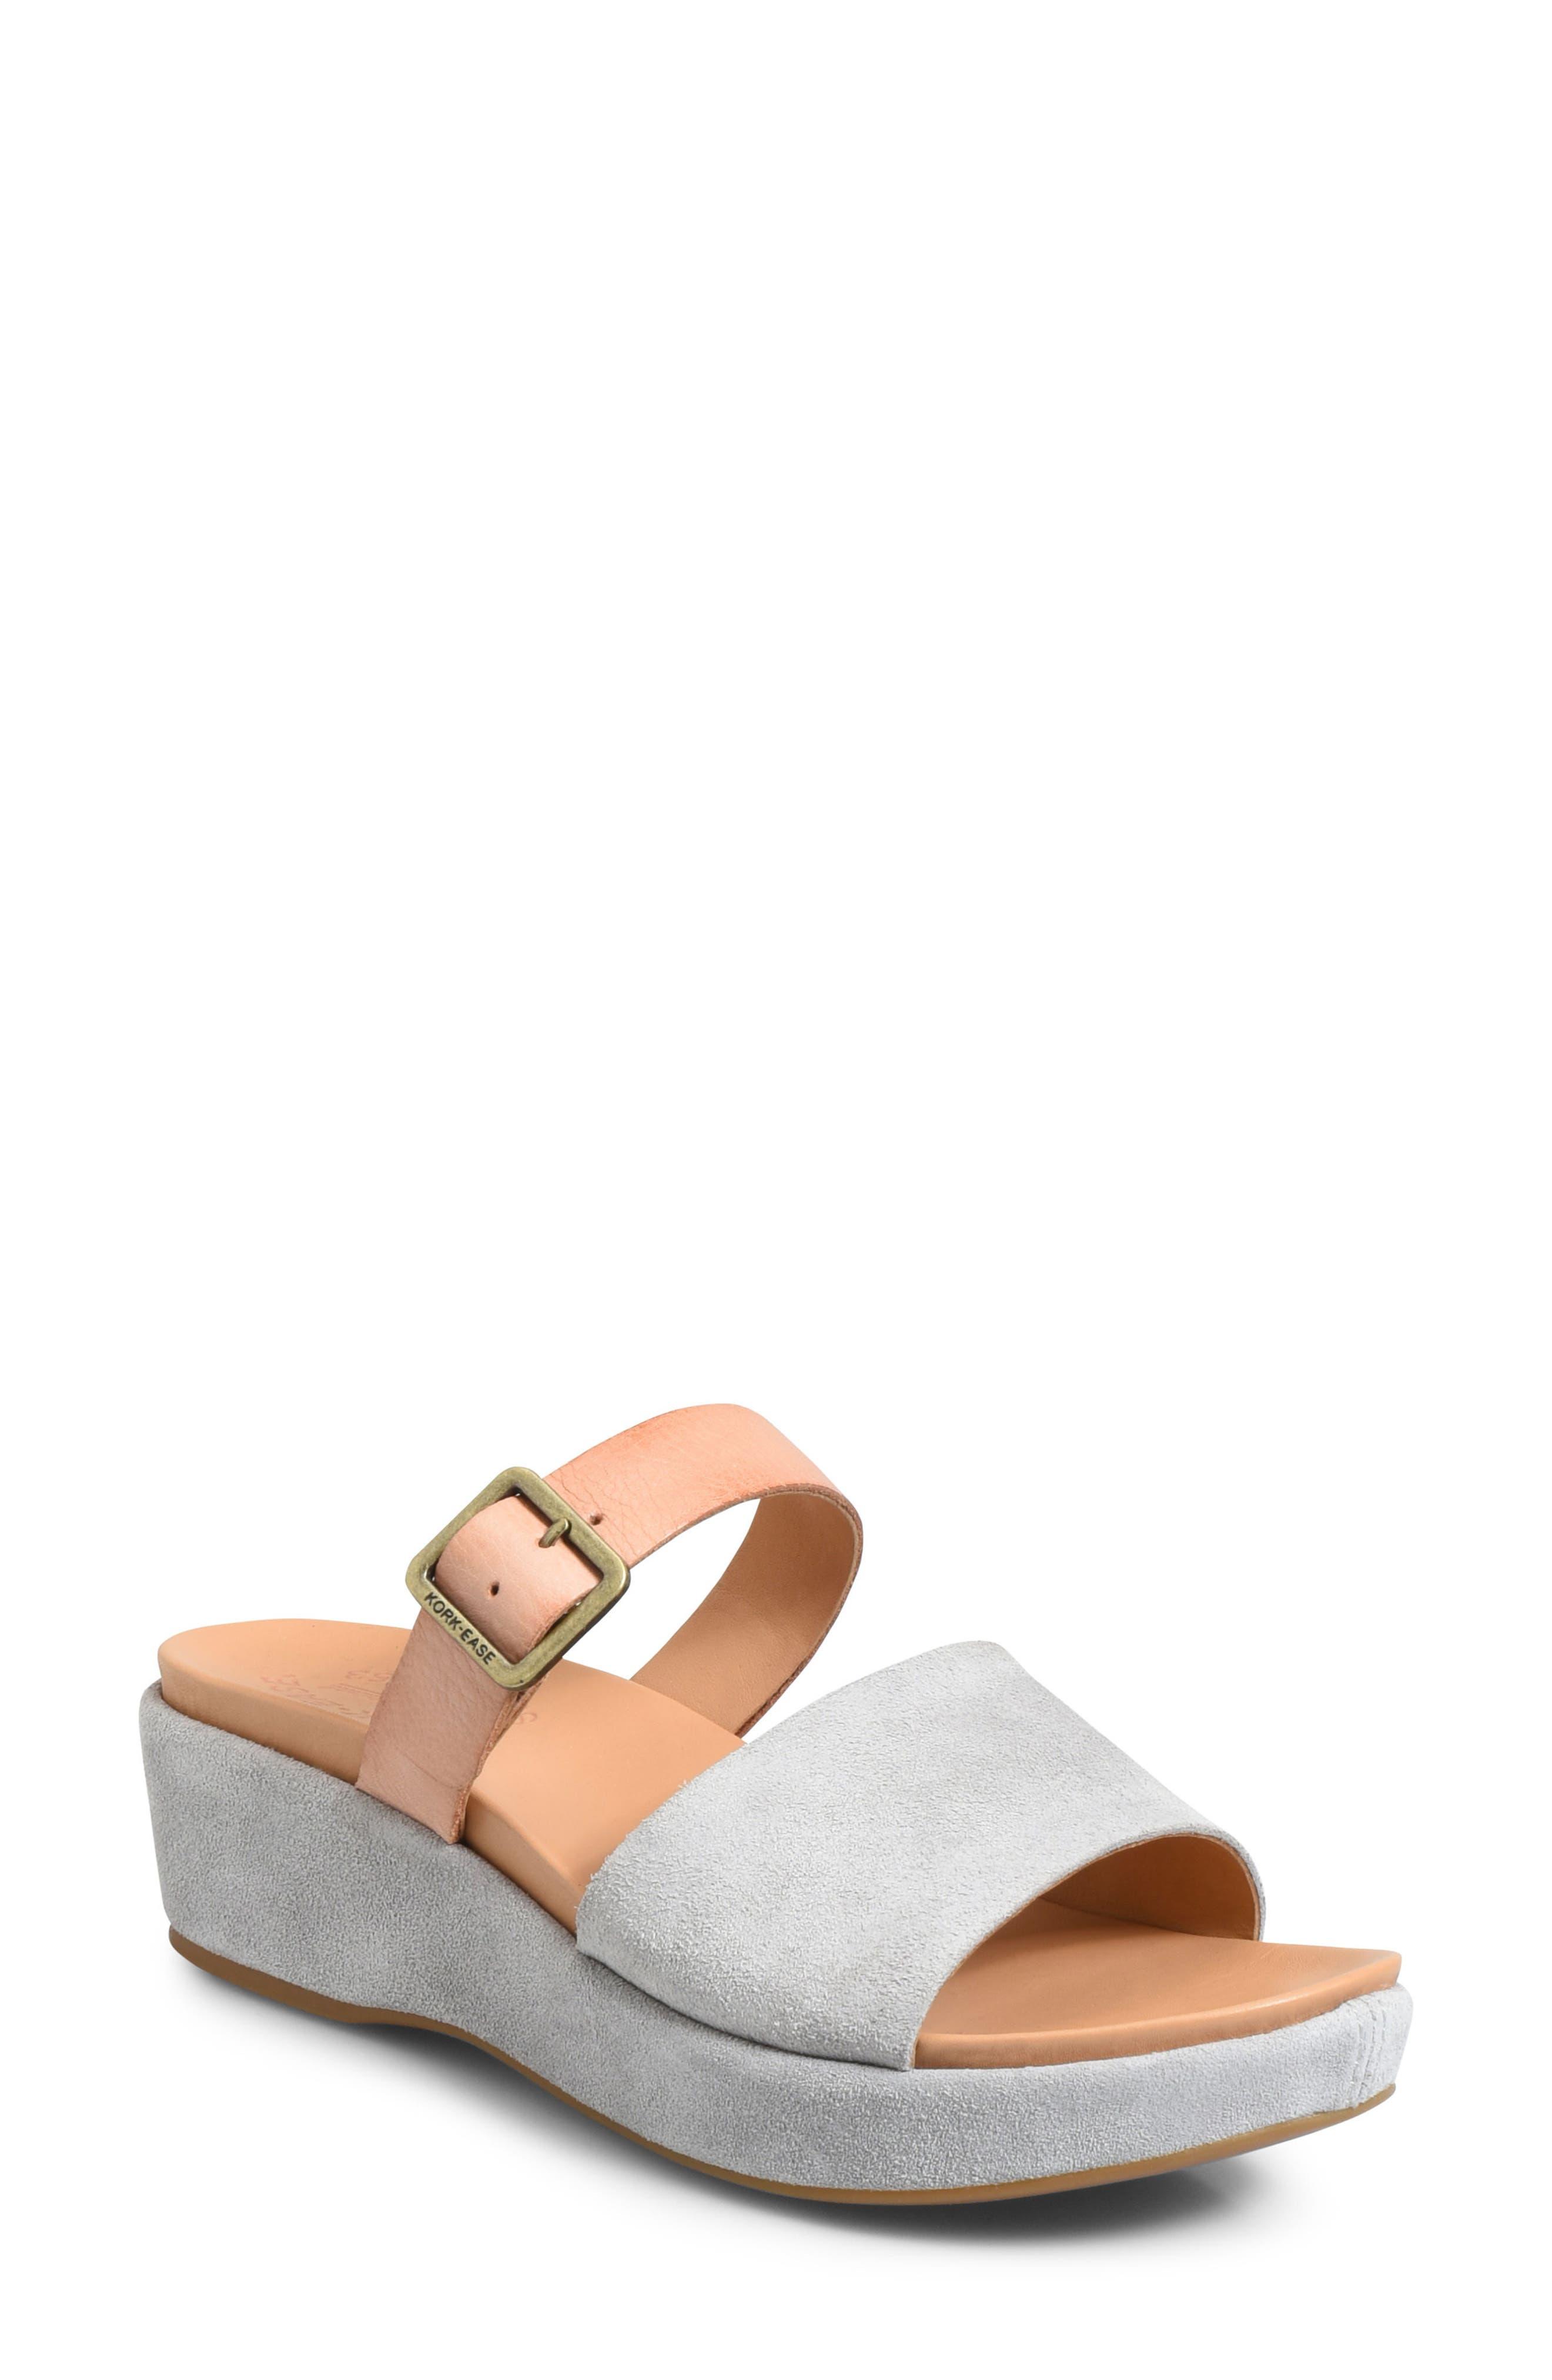 Kork-Ease Bisti Wedge Slide Sandal, Grey